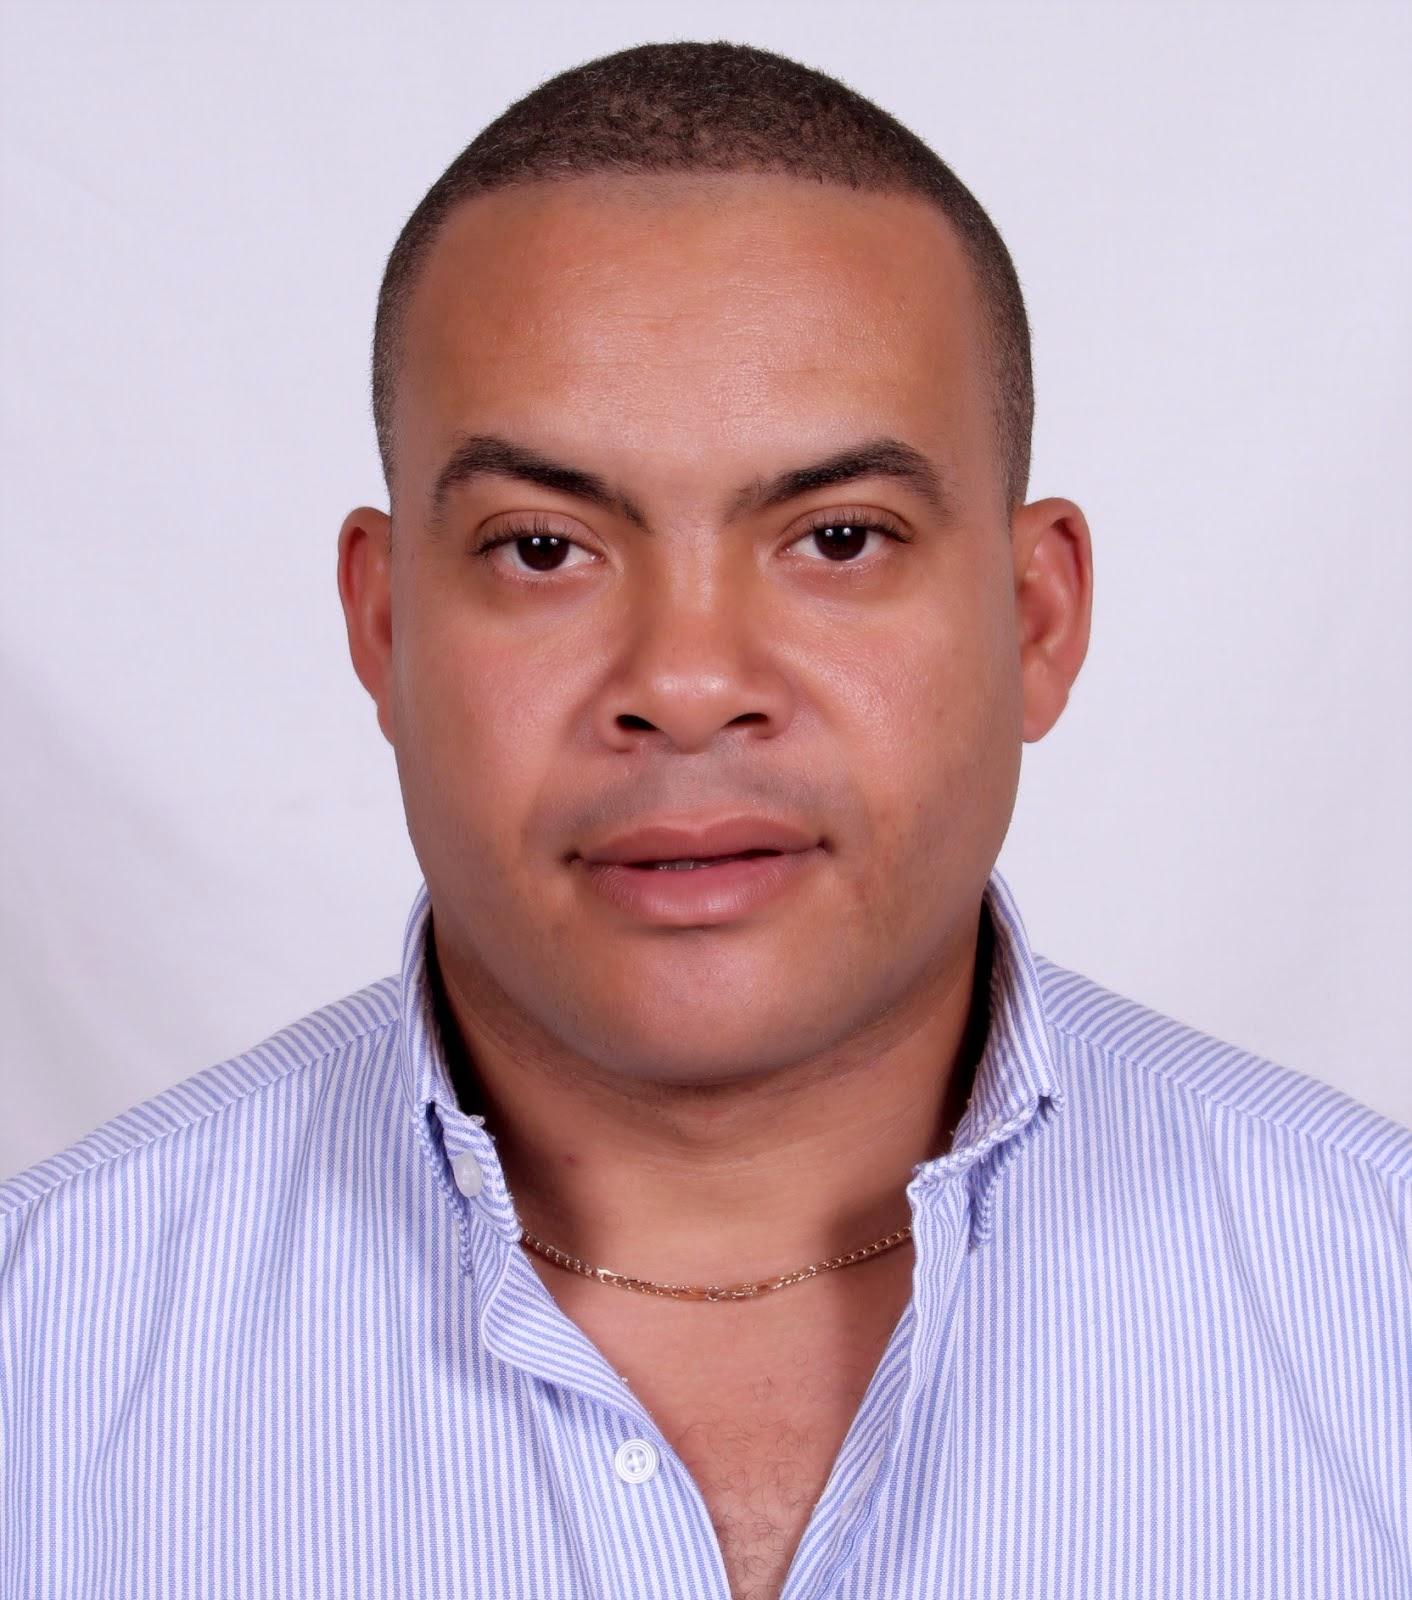 ING. CONCEPCION (MARIO) ORTIZ